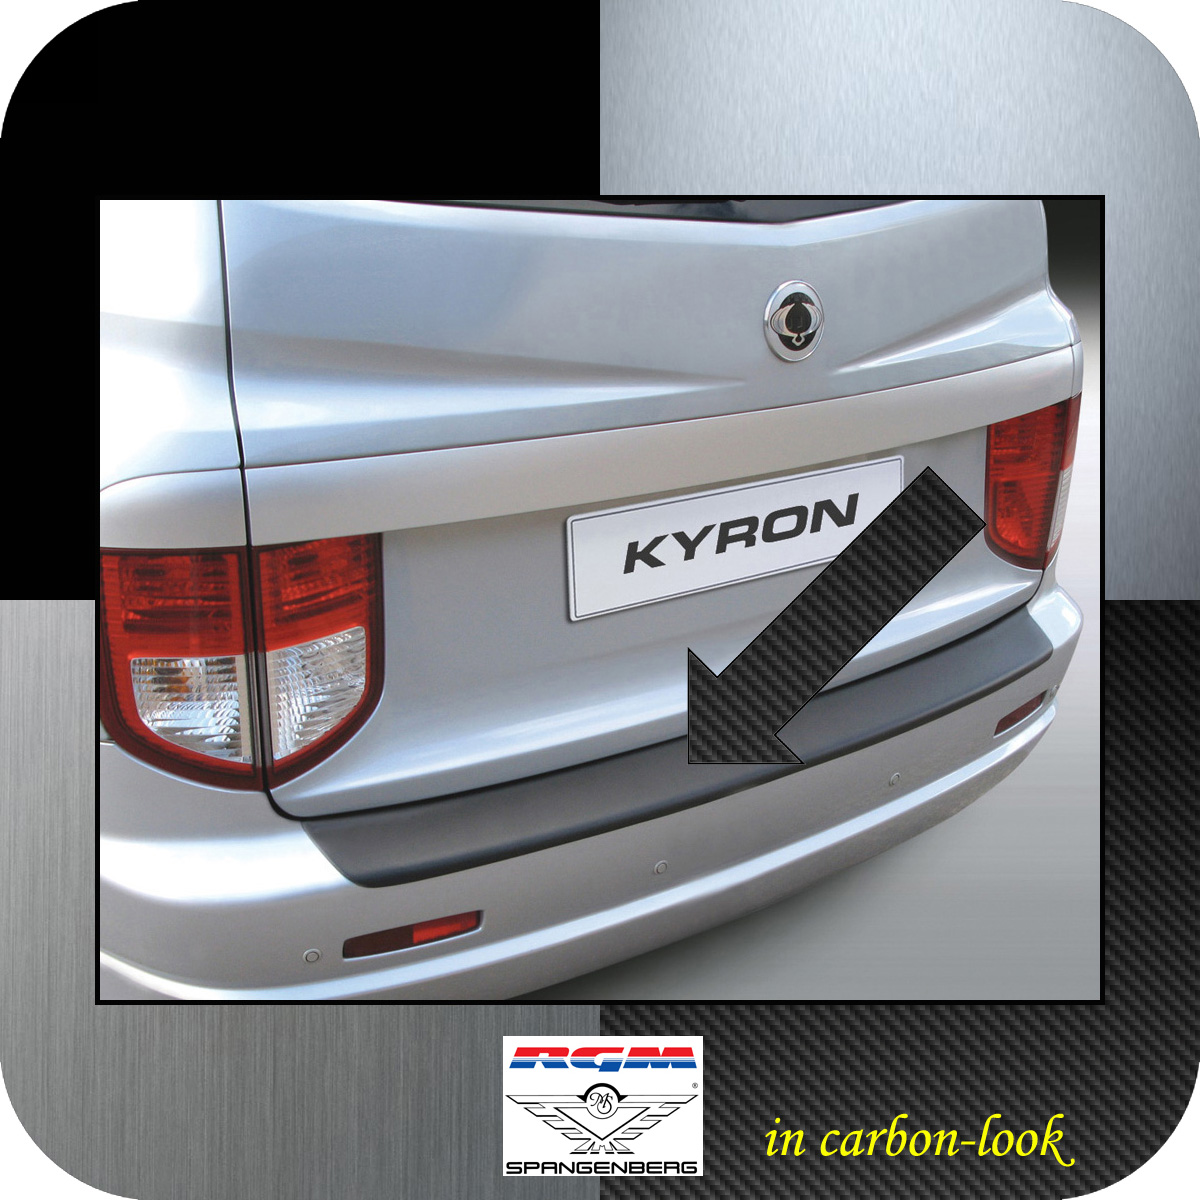 Ladekantenschutz Carbon-Look SsangYong Kyron SUV vor facelift 2005-2007 3509150